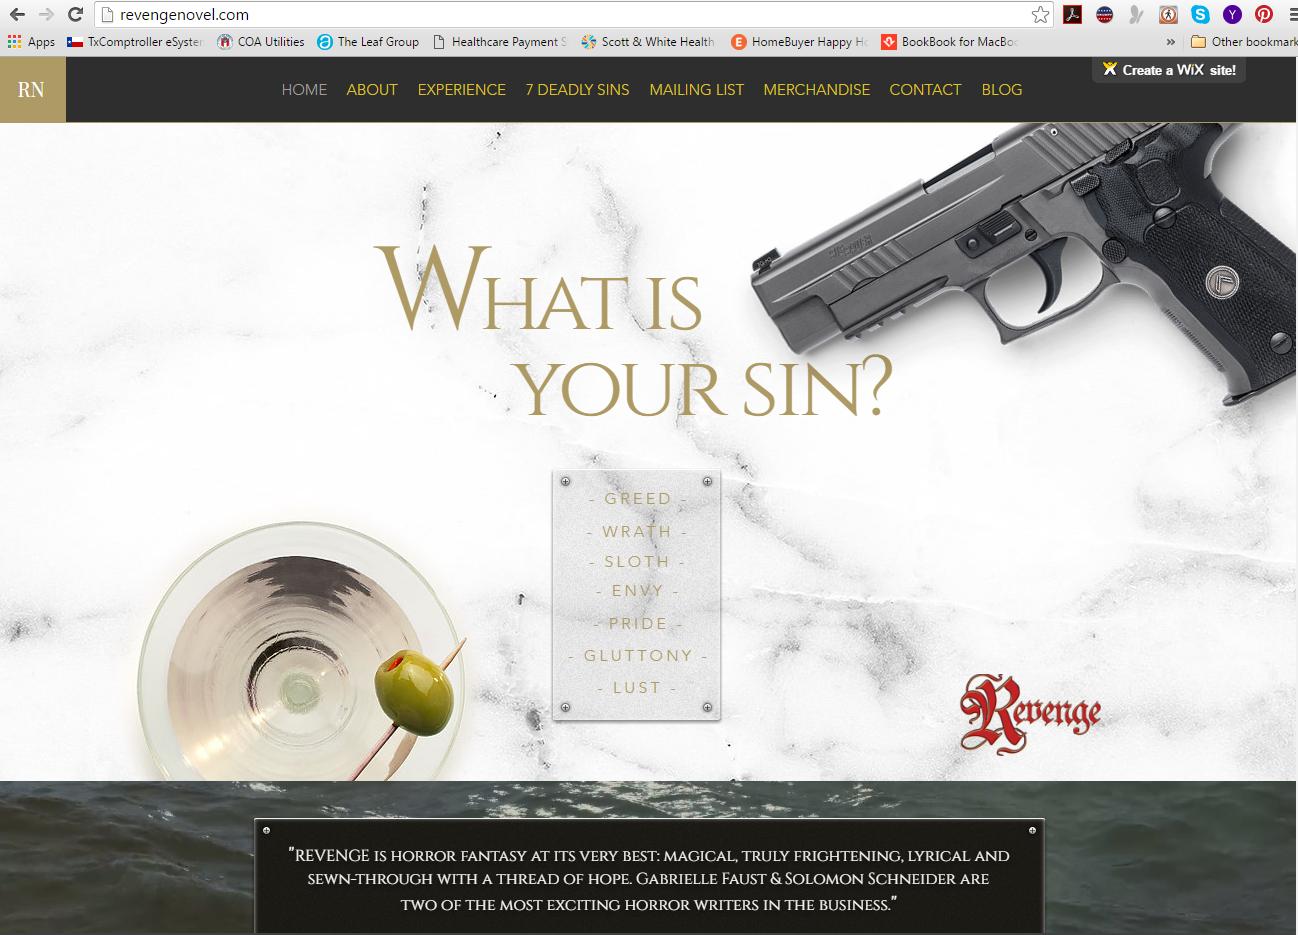 Revenge Website Home Page